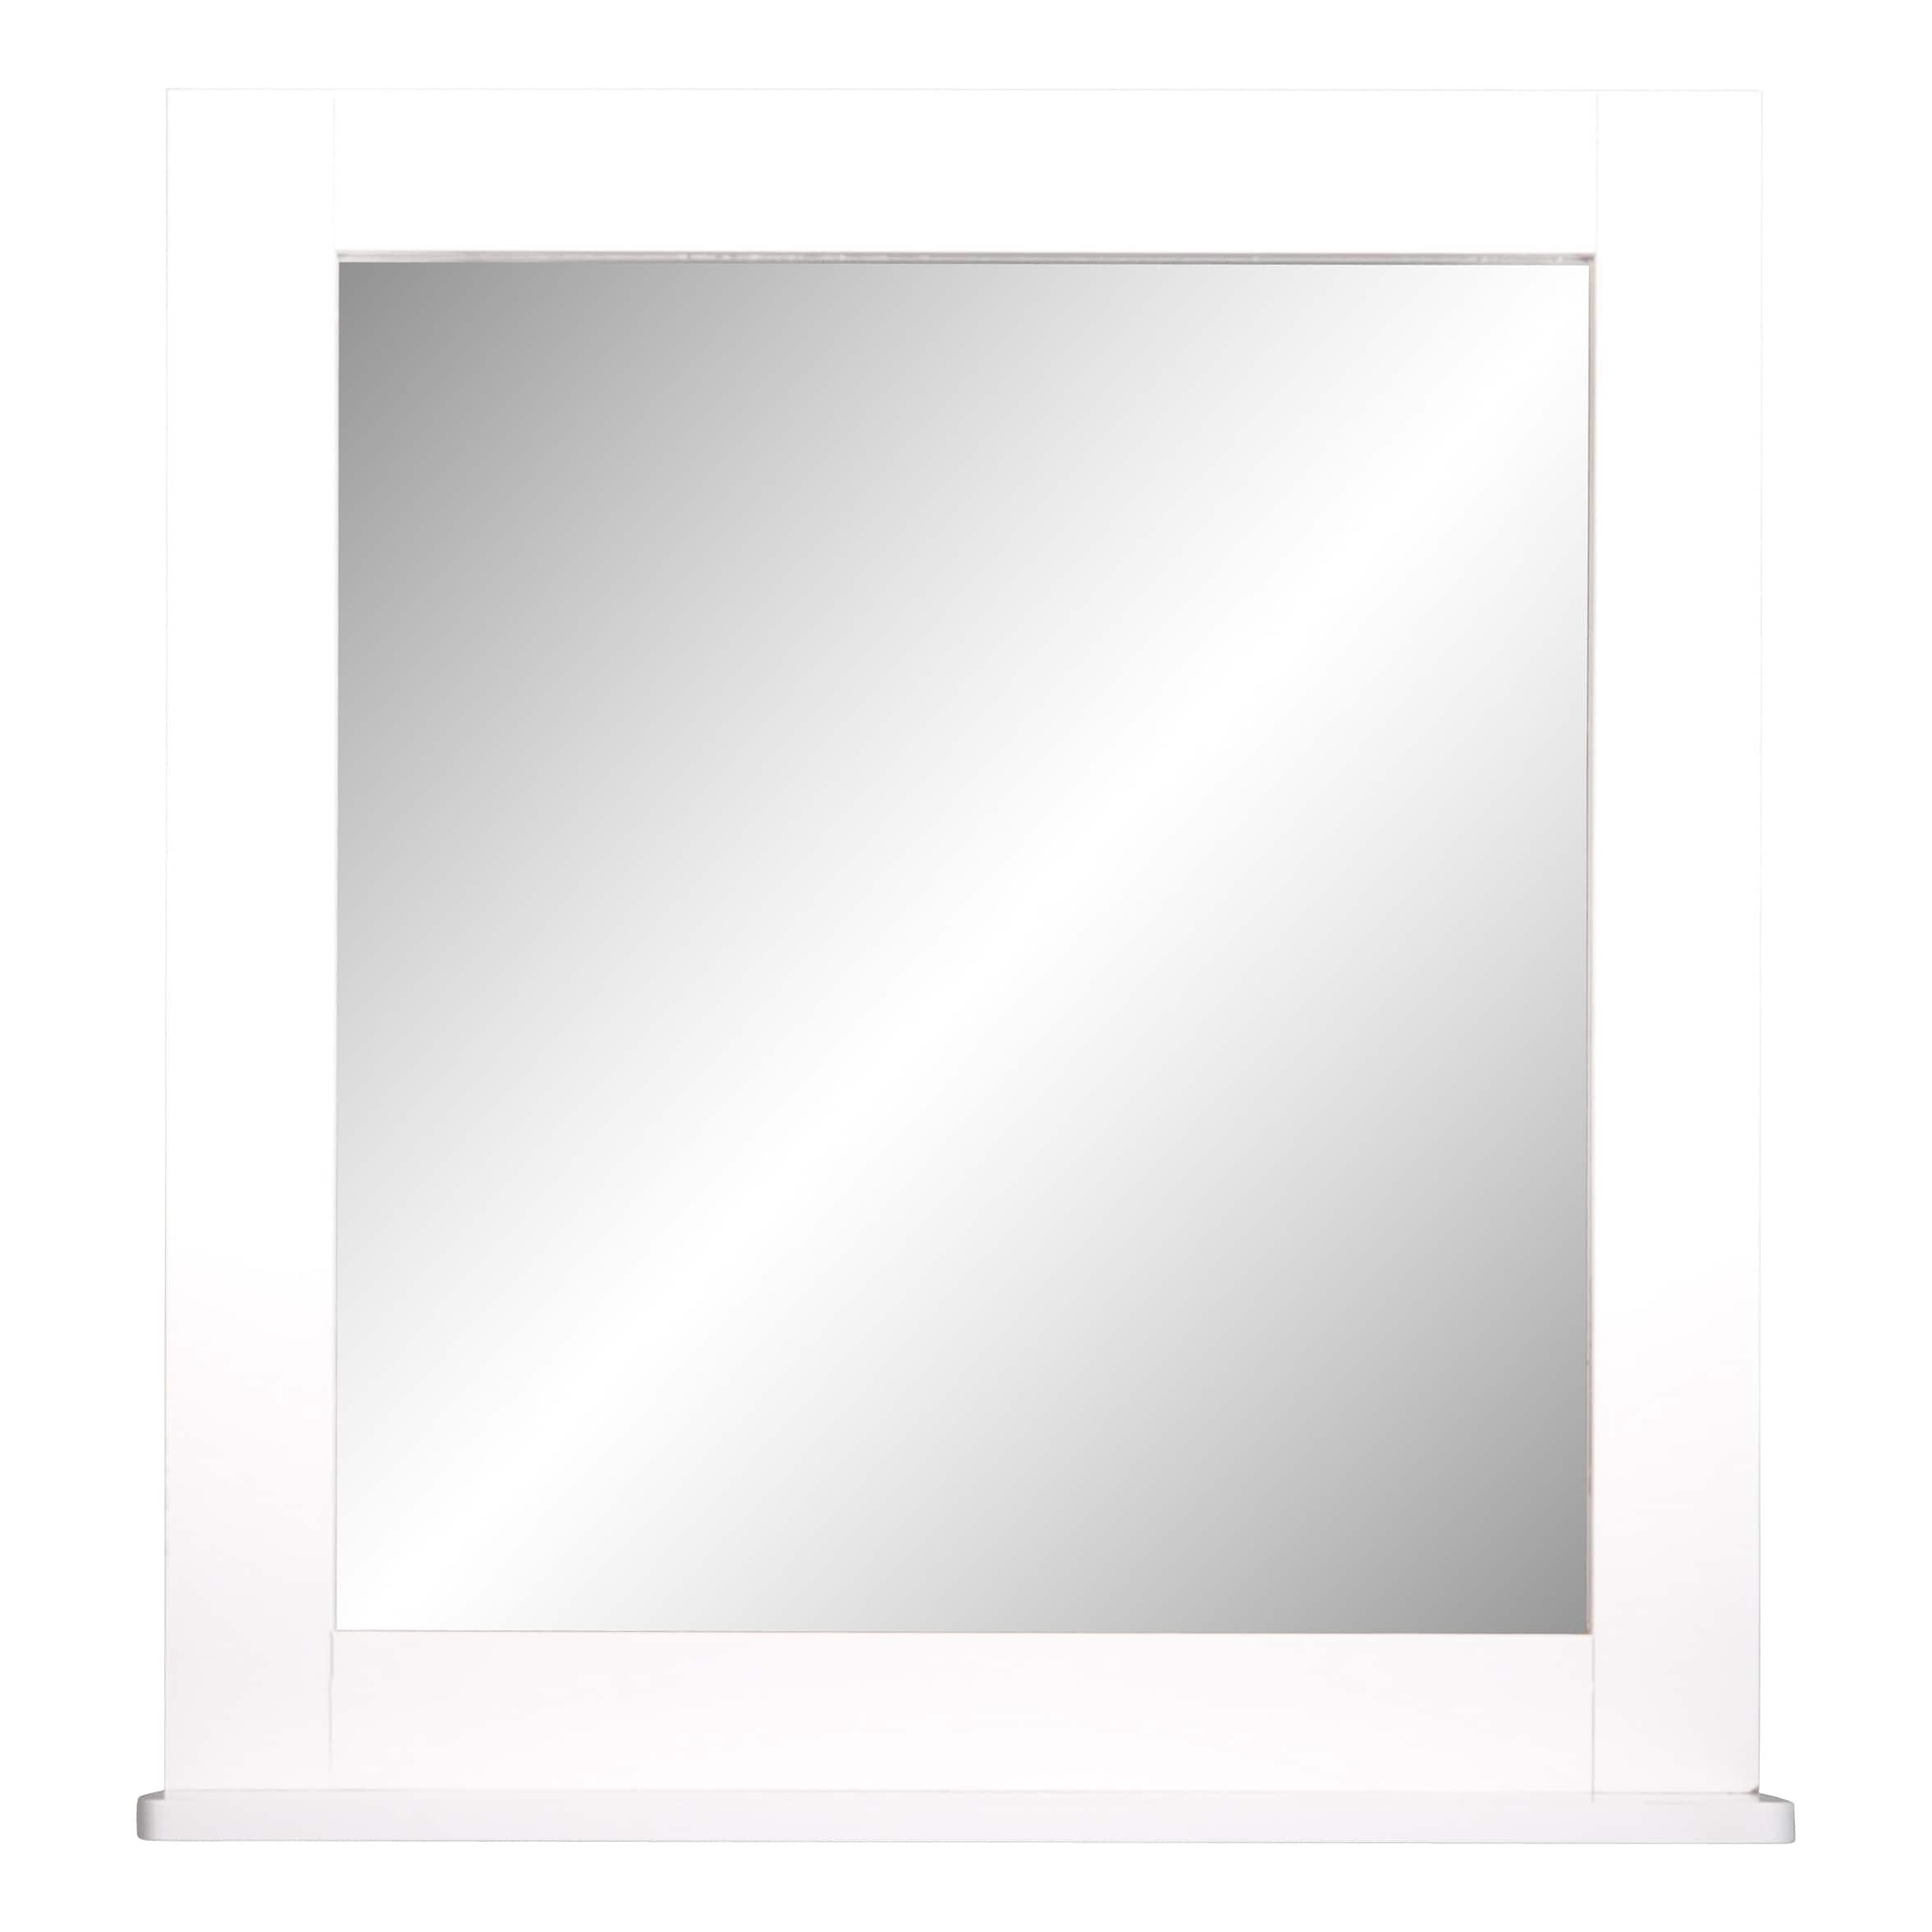 4goodz Badkamer Spiegel Vierkant met legplank Miami 48x10x53 cm - Wit